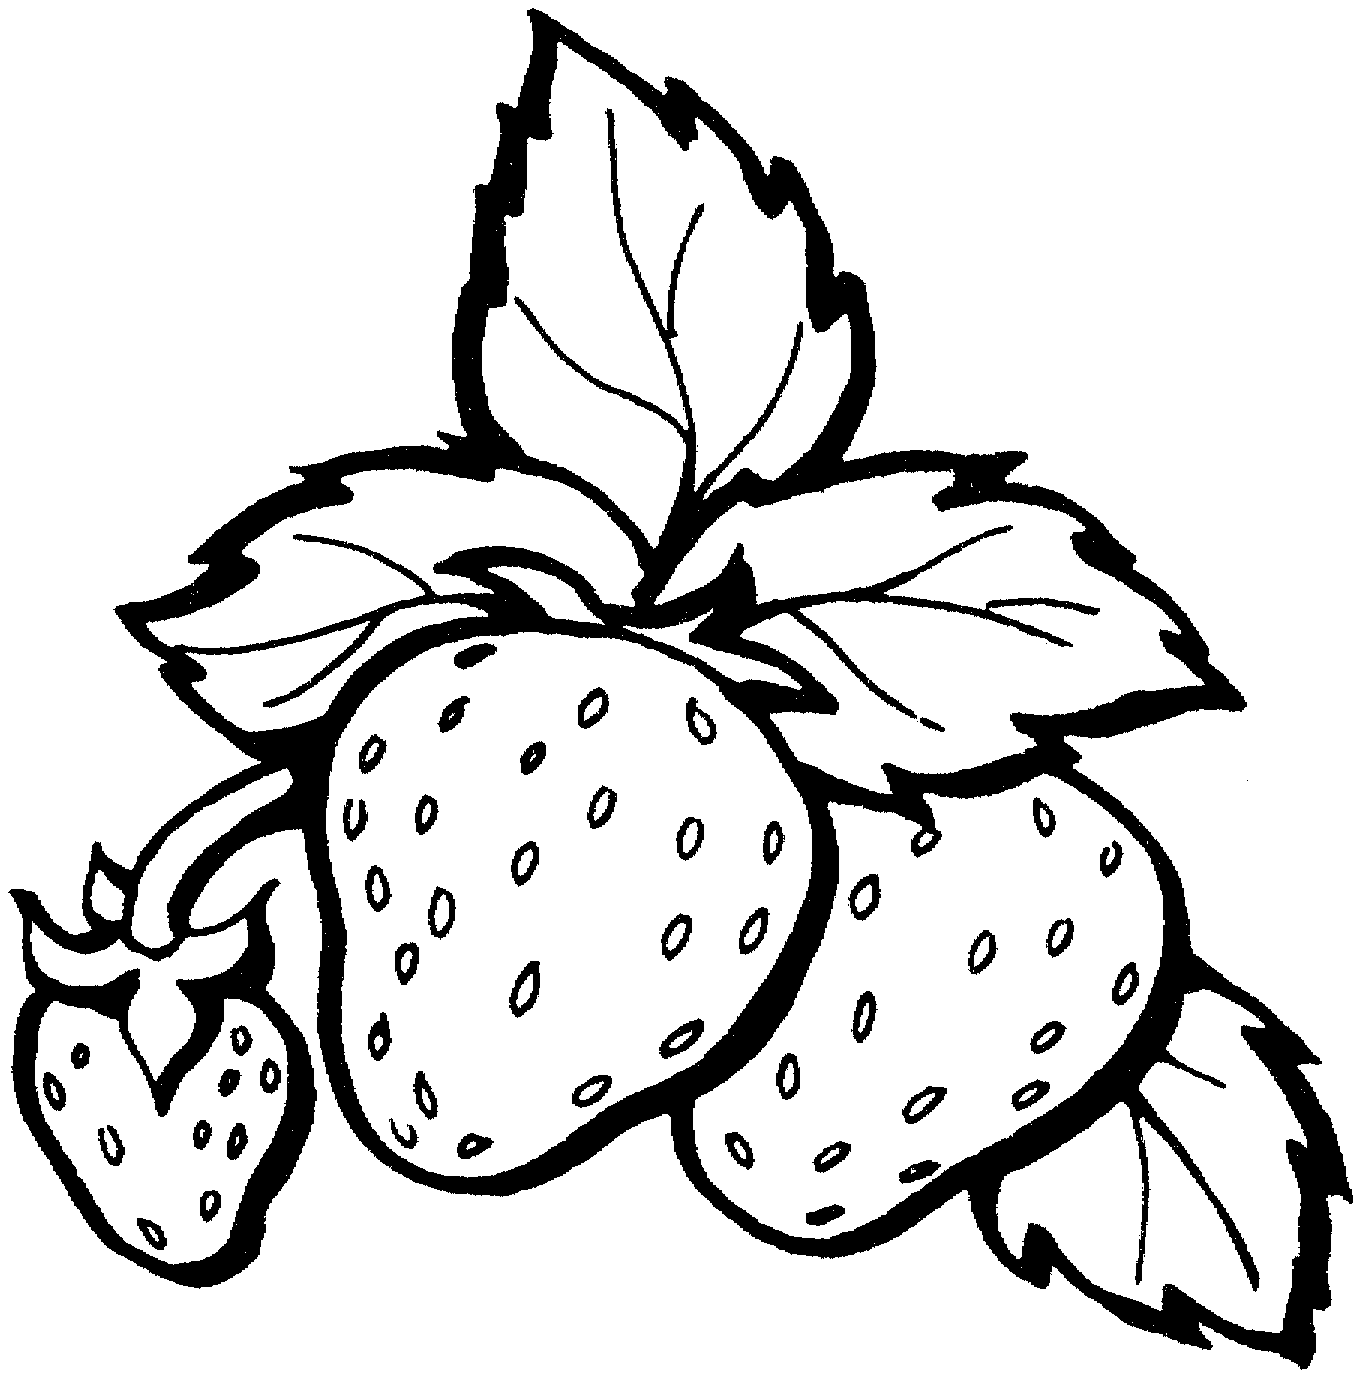 Gambar Mewarnai Buah Strawberry 4